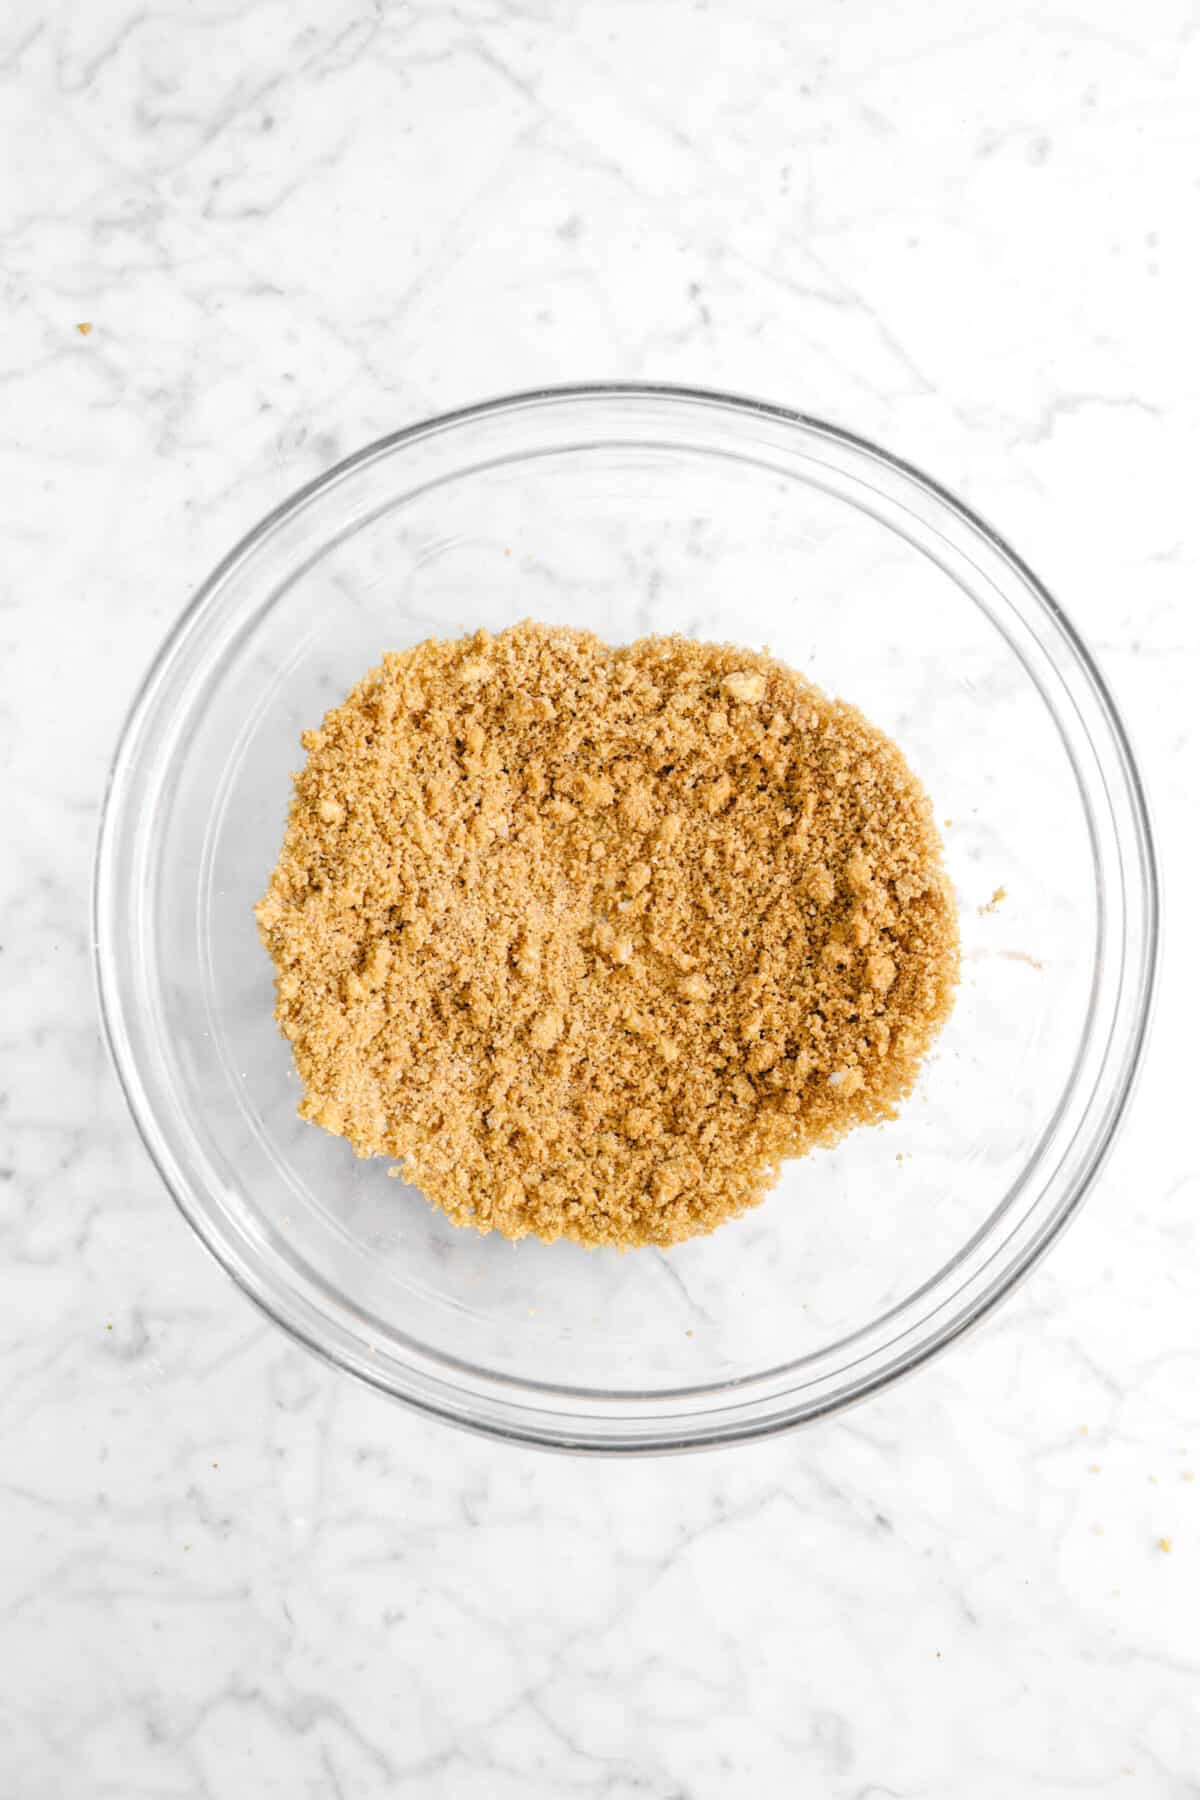 brown sugar mixture in glass bowl